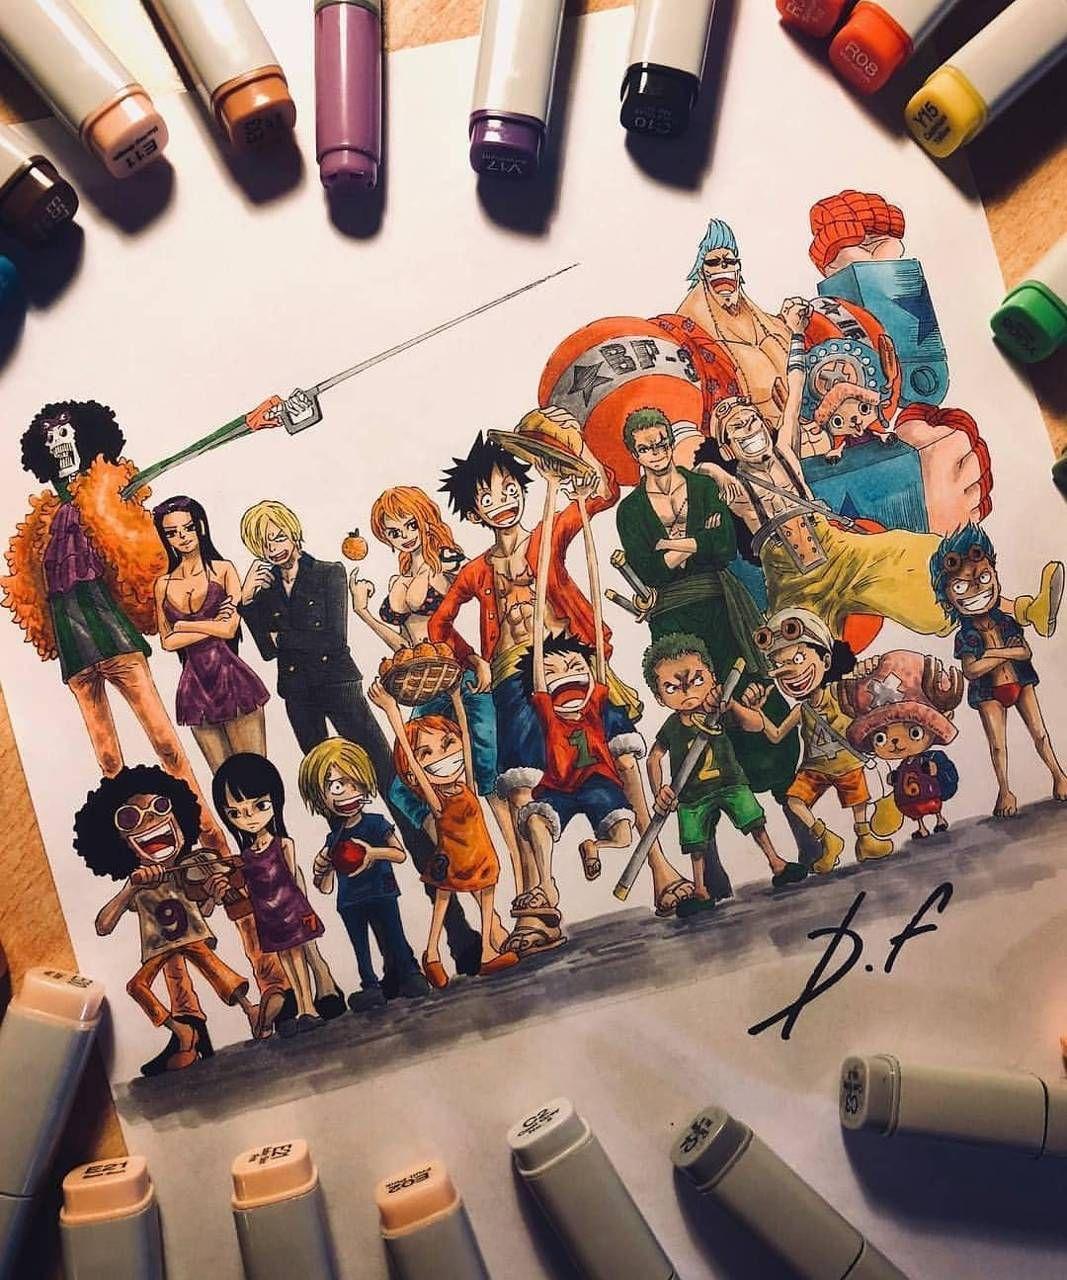 One Piece Wallpaper by rijan2211 4d Free on ZEDGE